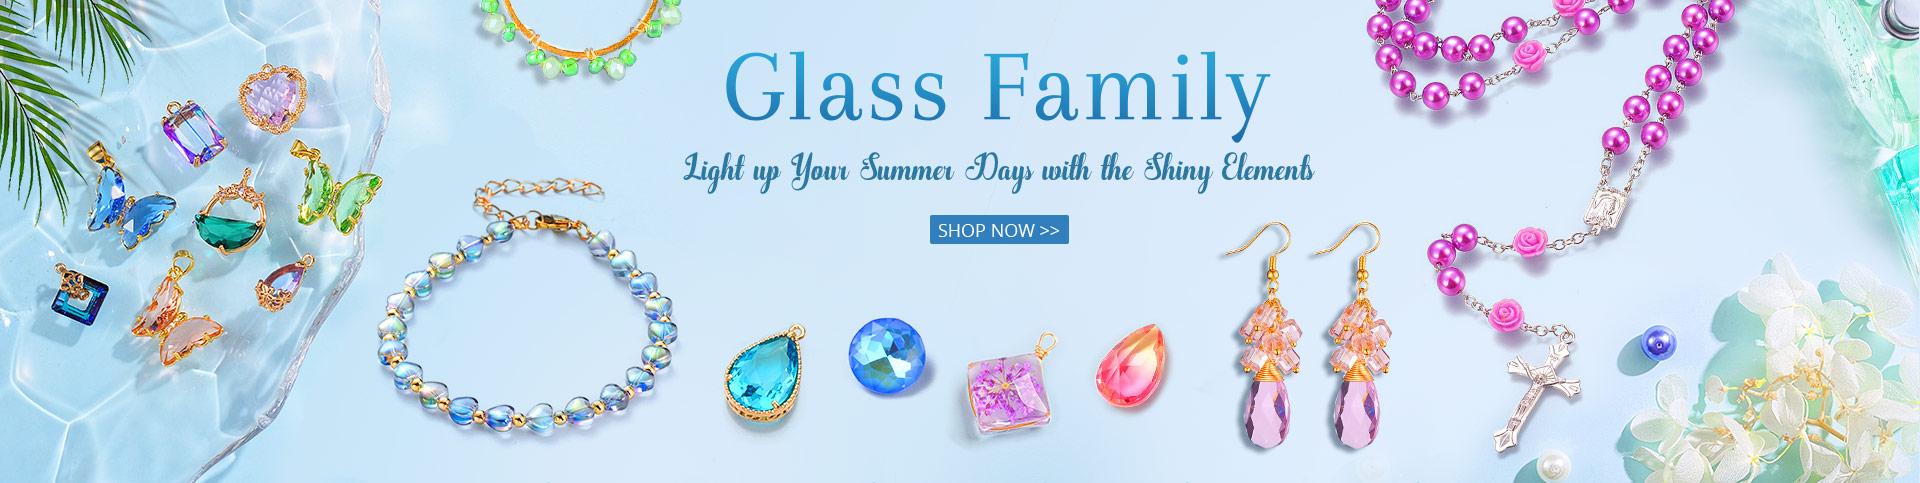 Glass Family